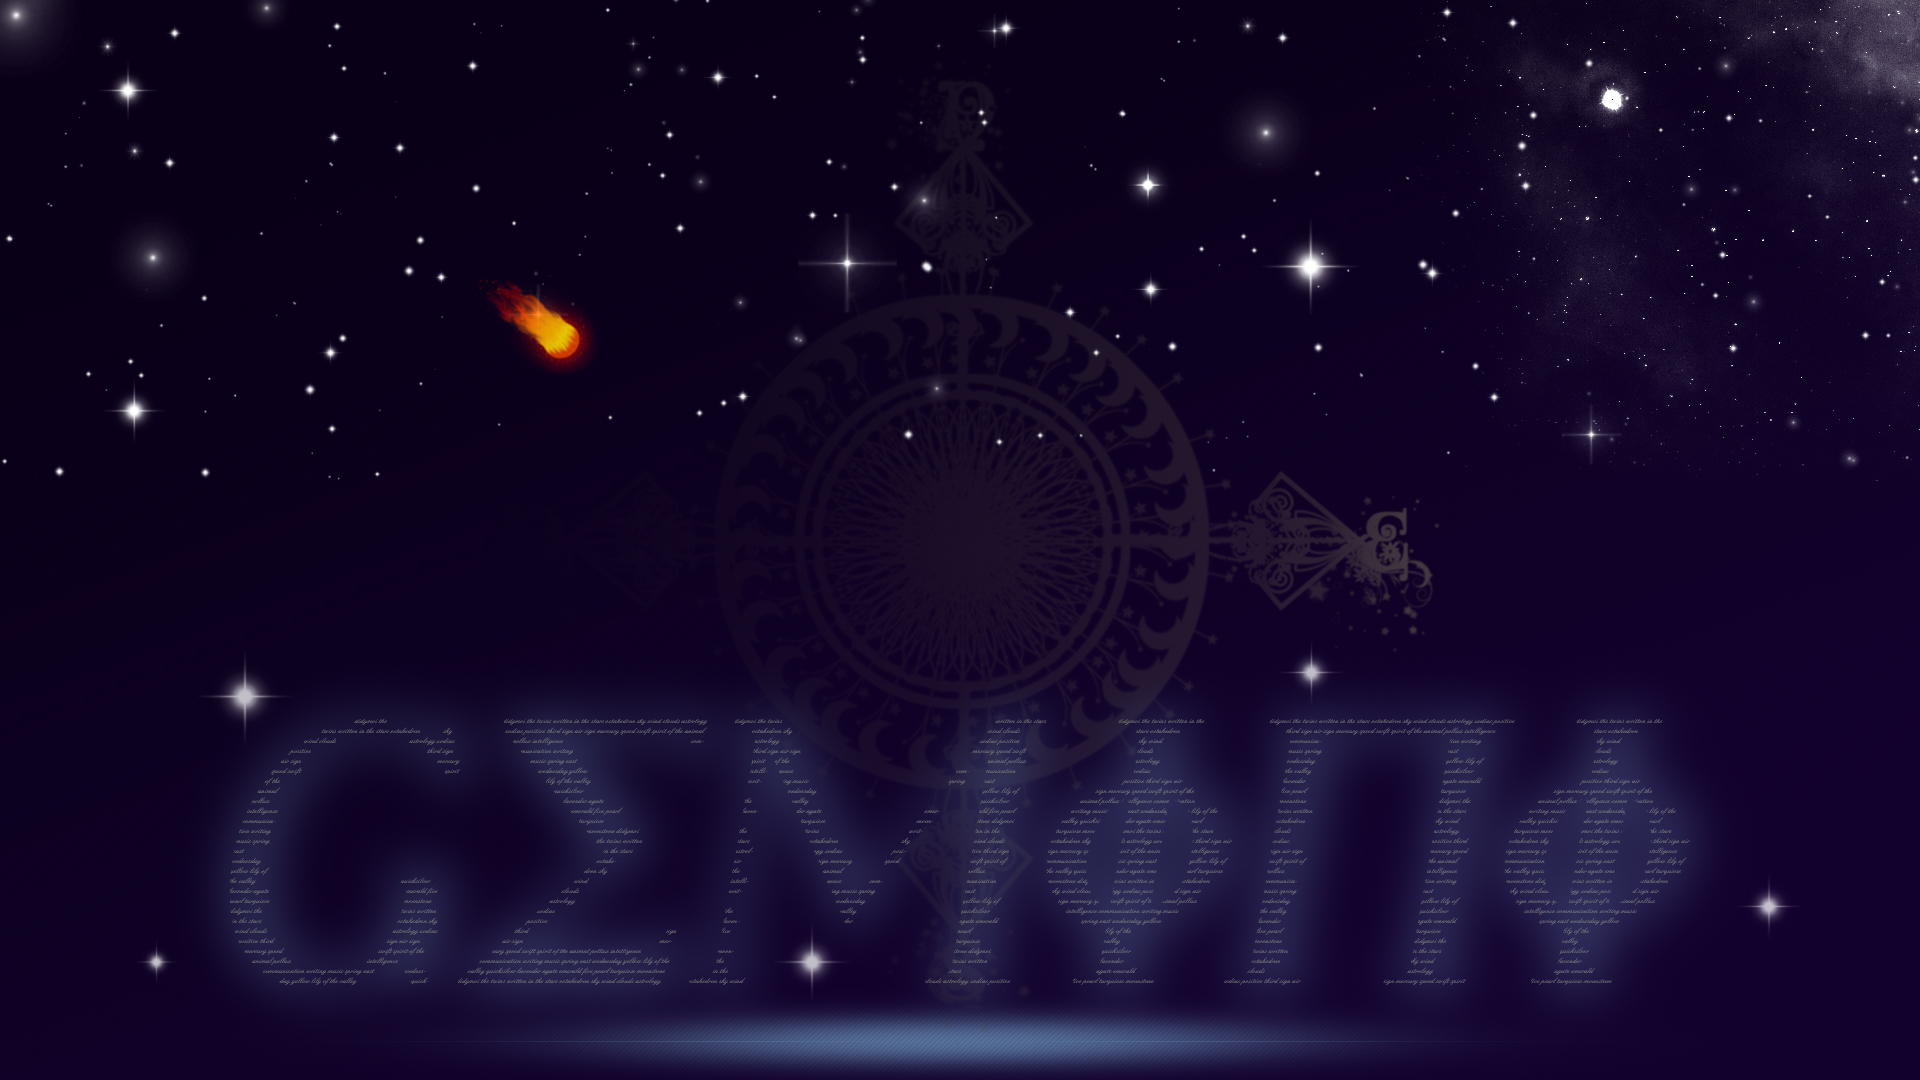 Gemini Zodiac Astrology Symbolic Hd Wallpaper By Sleepy Stardust On Deviantart